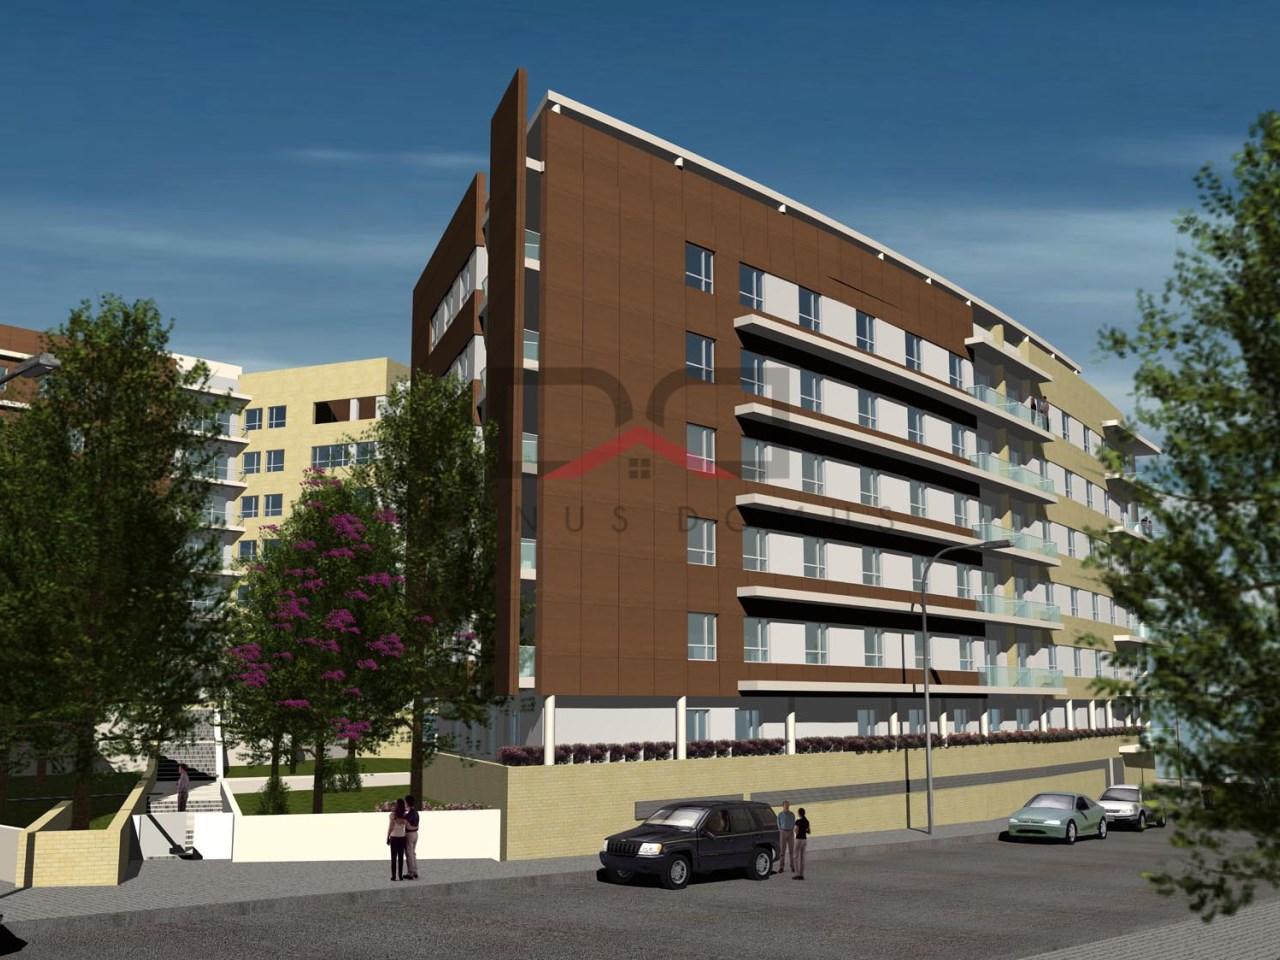 d239881b4785 Apartamento T3 no Olaia Parque Resid\u00eancias - Fachada